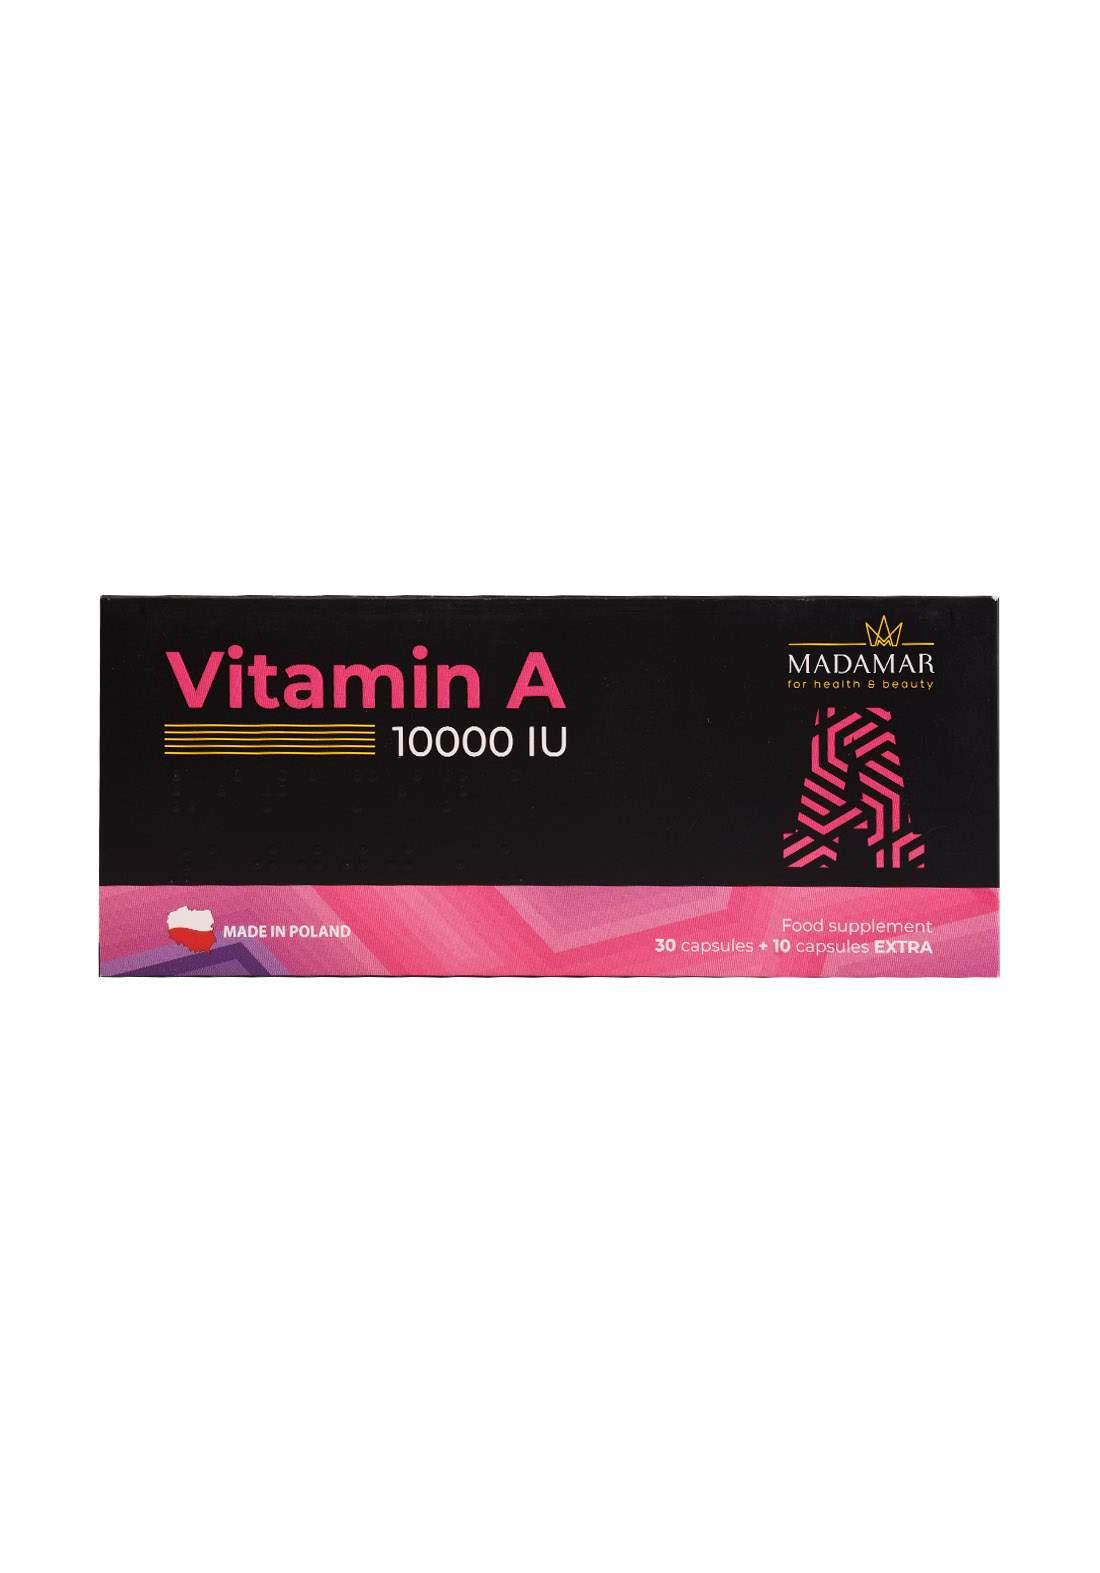 Madamar Vitamin A 10000 iu 30capsule +10capsules Extra  مكمل غذائي